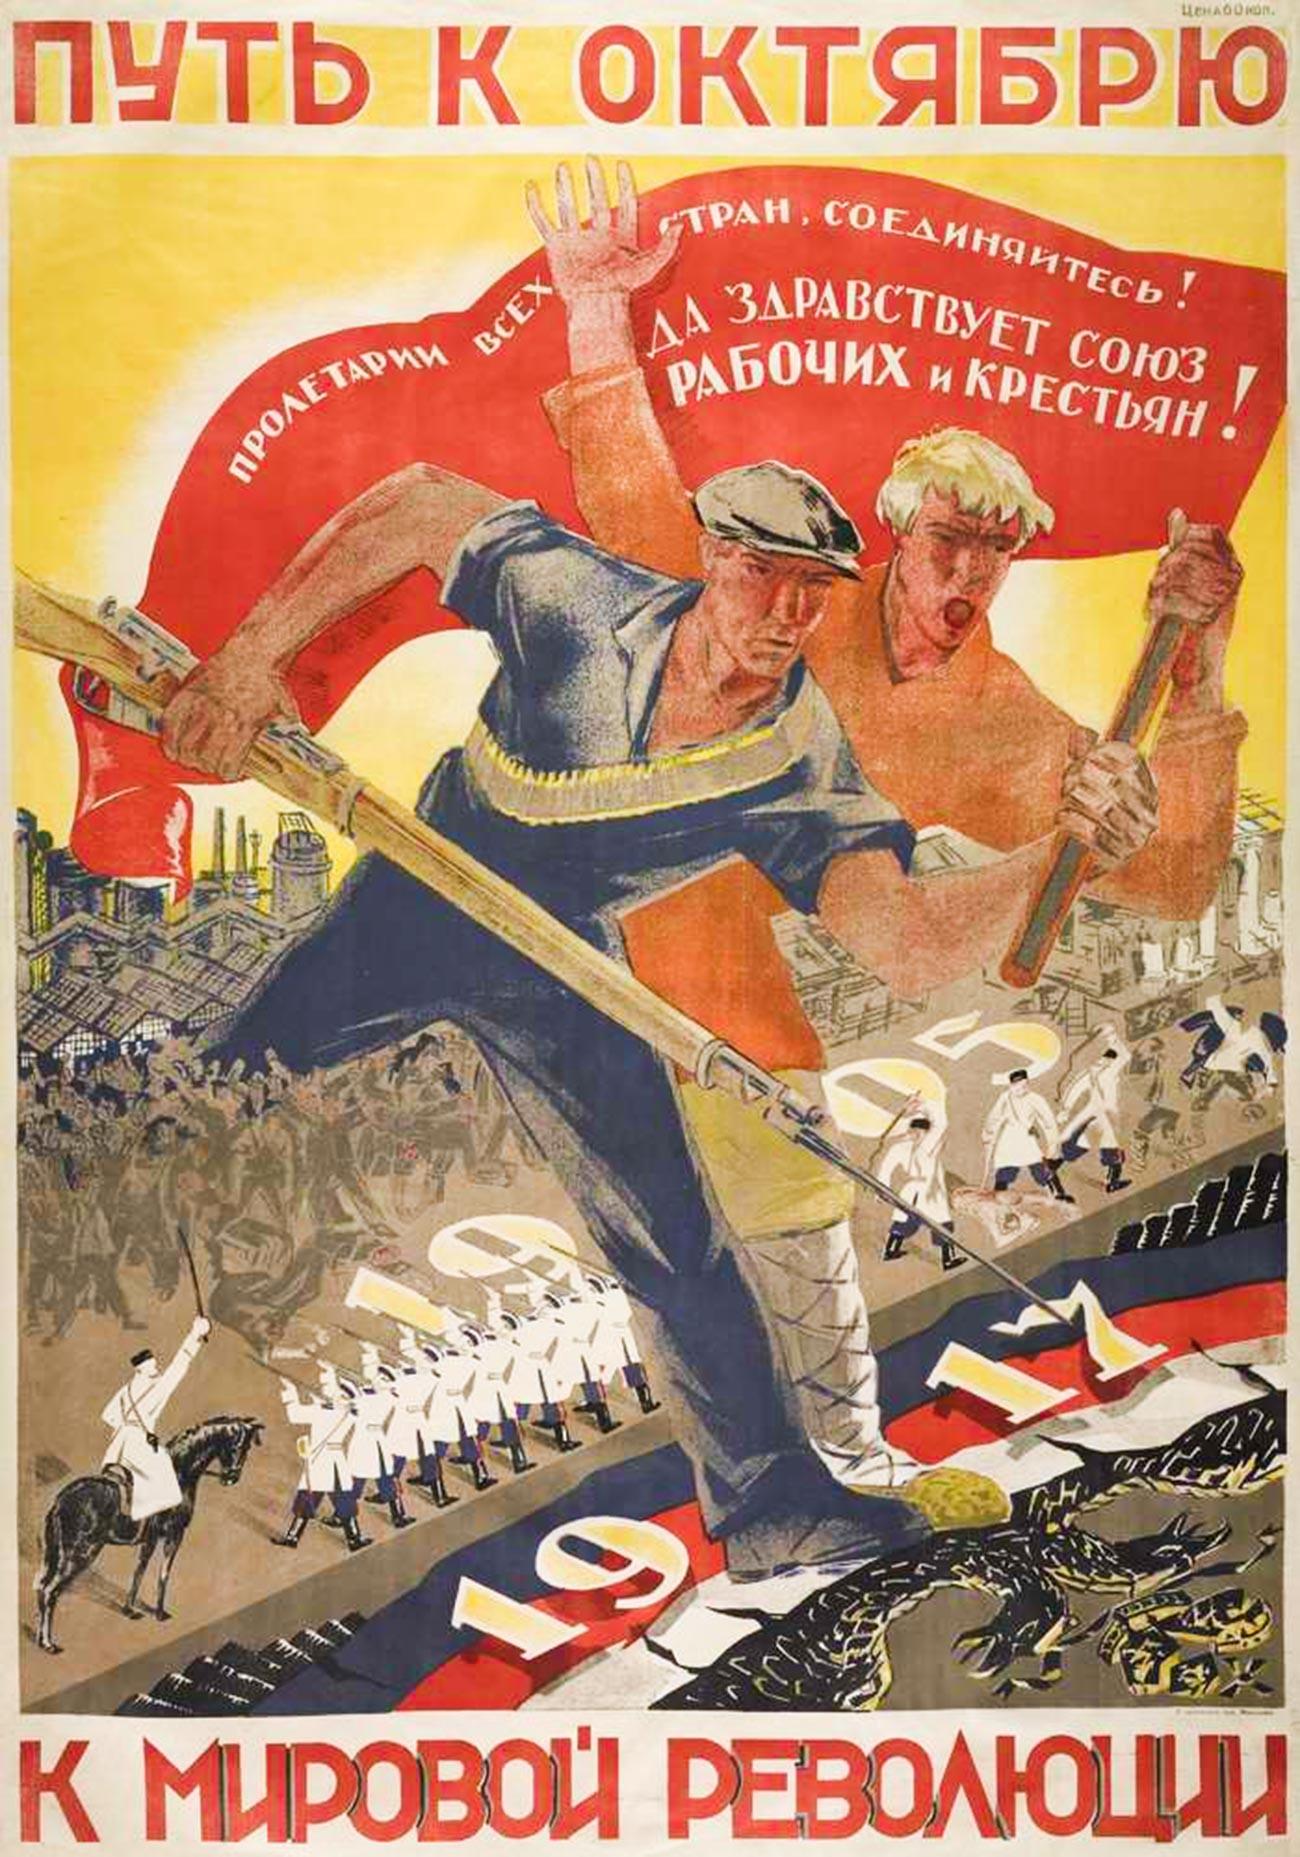 Jalan menuju (Revolusi) Oktober. Proletar dunia, bersatulah! Hidup serikat pekerja dan petani!